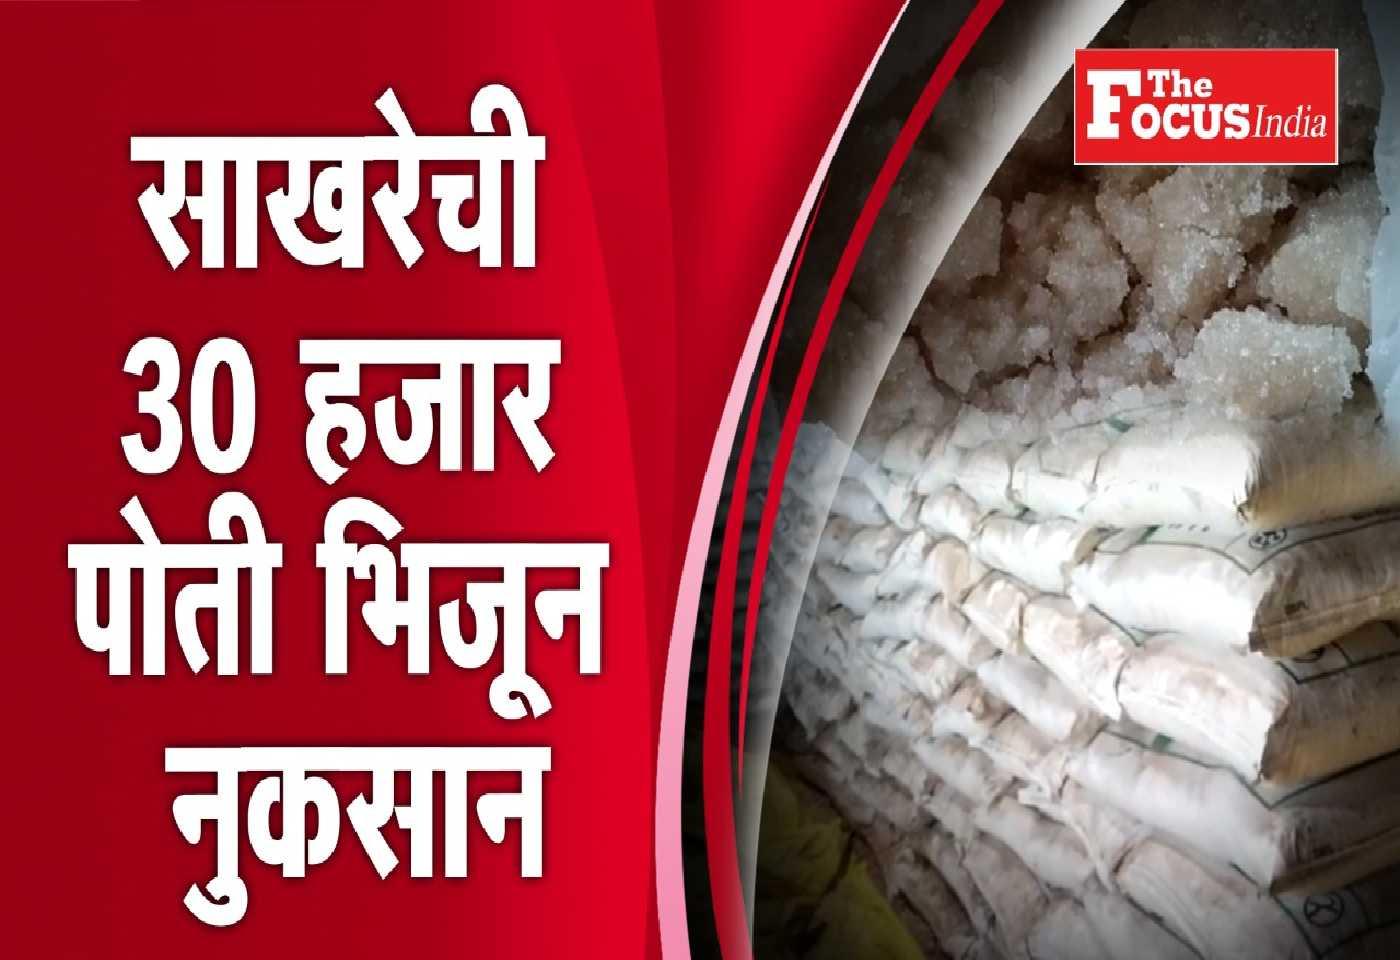 Watch In Beed 30000 bags of sugar got Wet in Yedeshwari factory due to rains